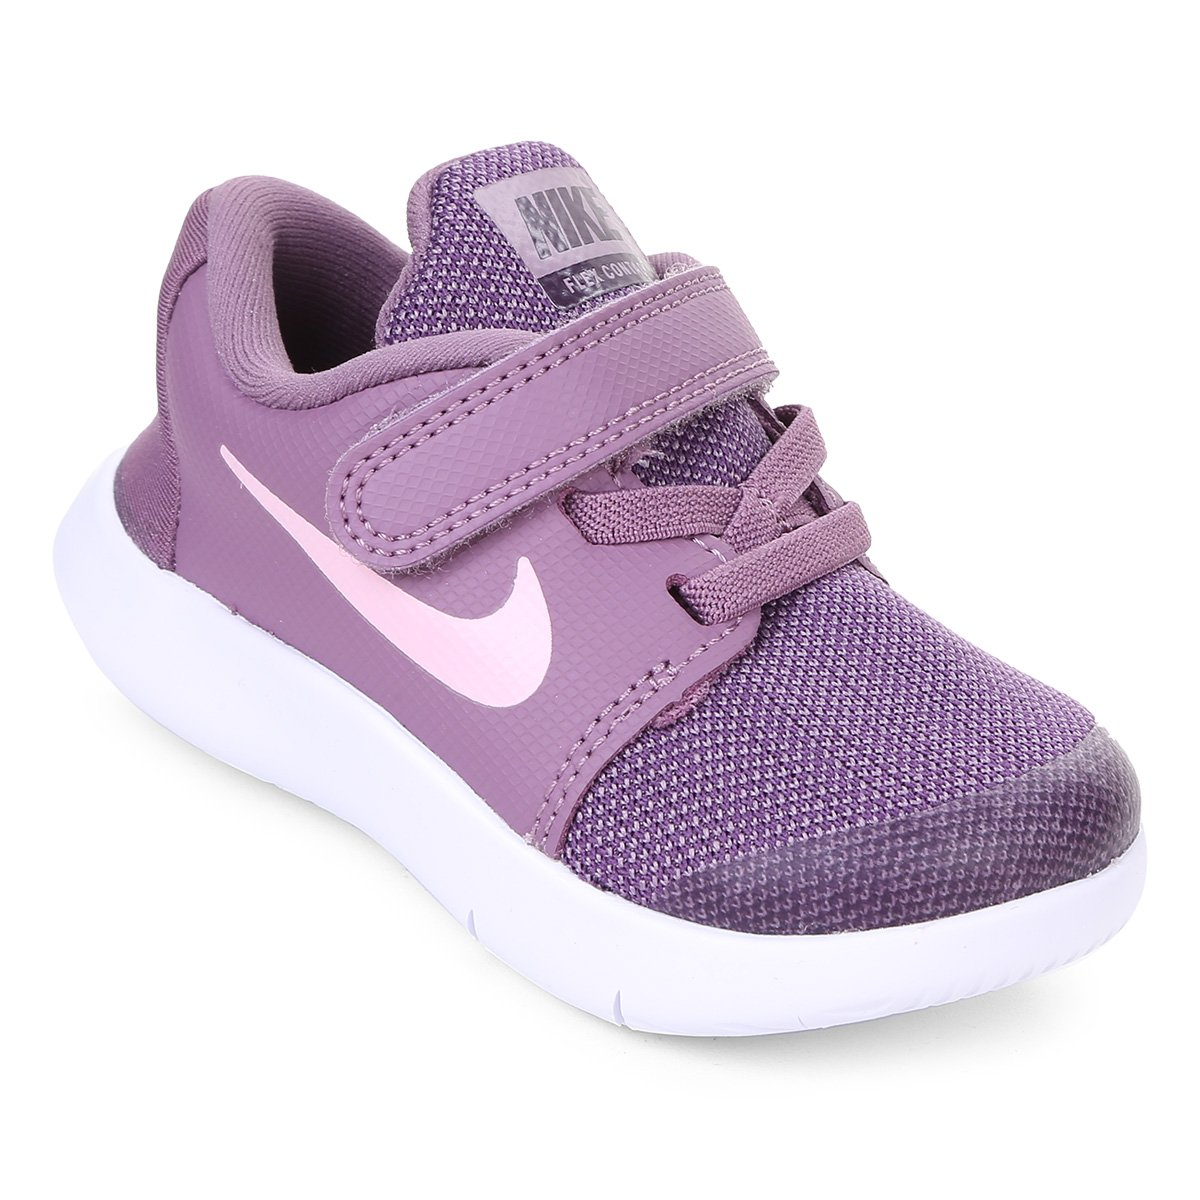 3ba8be280 Tênis Infantil Nike Flex Contact Velcro Feminino